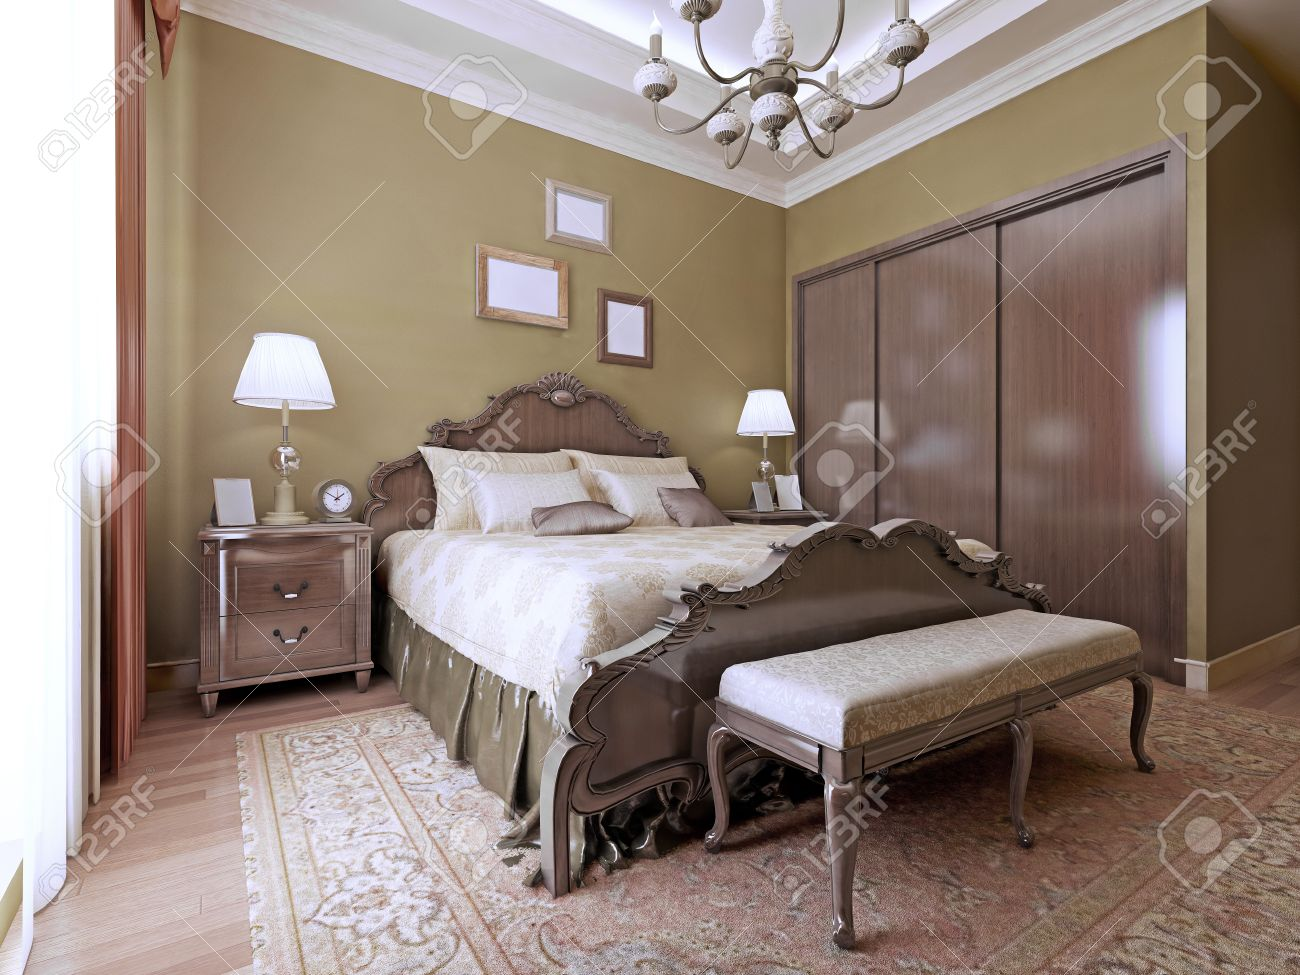 Luxury Bedroom English Style Luxurious Bed With Headboard Handmade